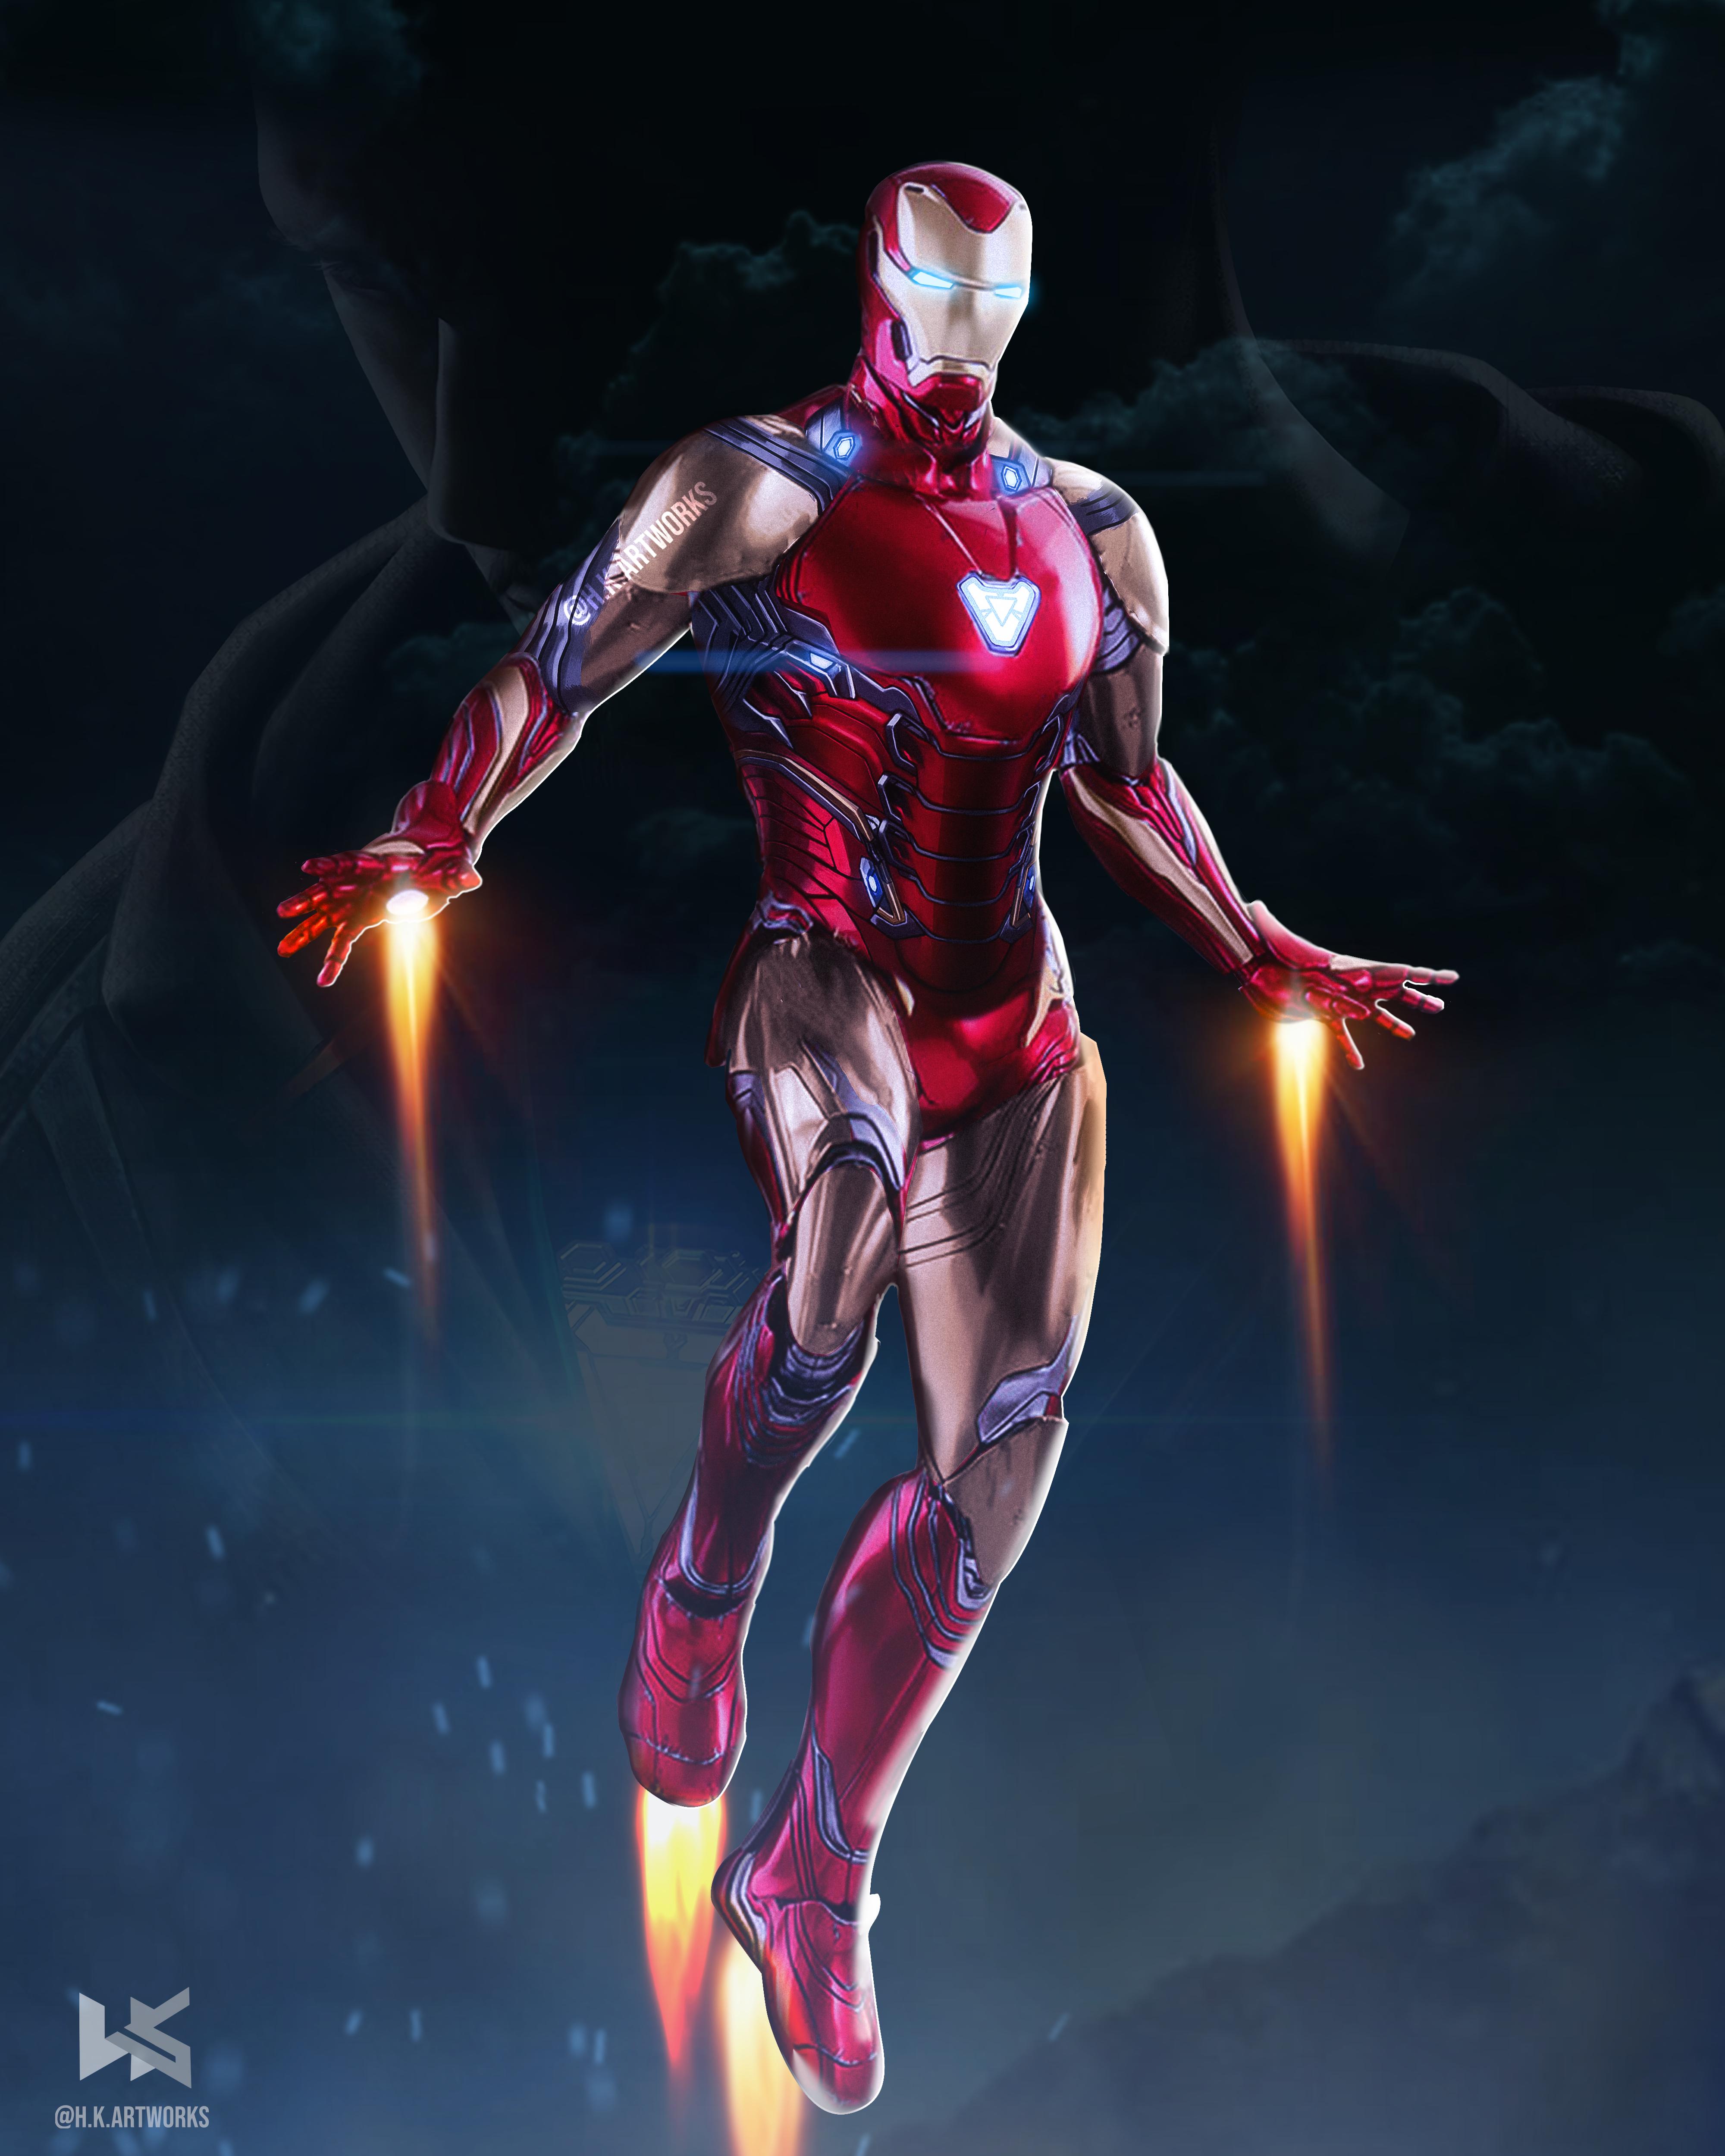 Iron man Mark 85 art By hkartworks Marvel Iron Man 4000x5000